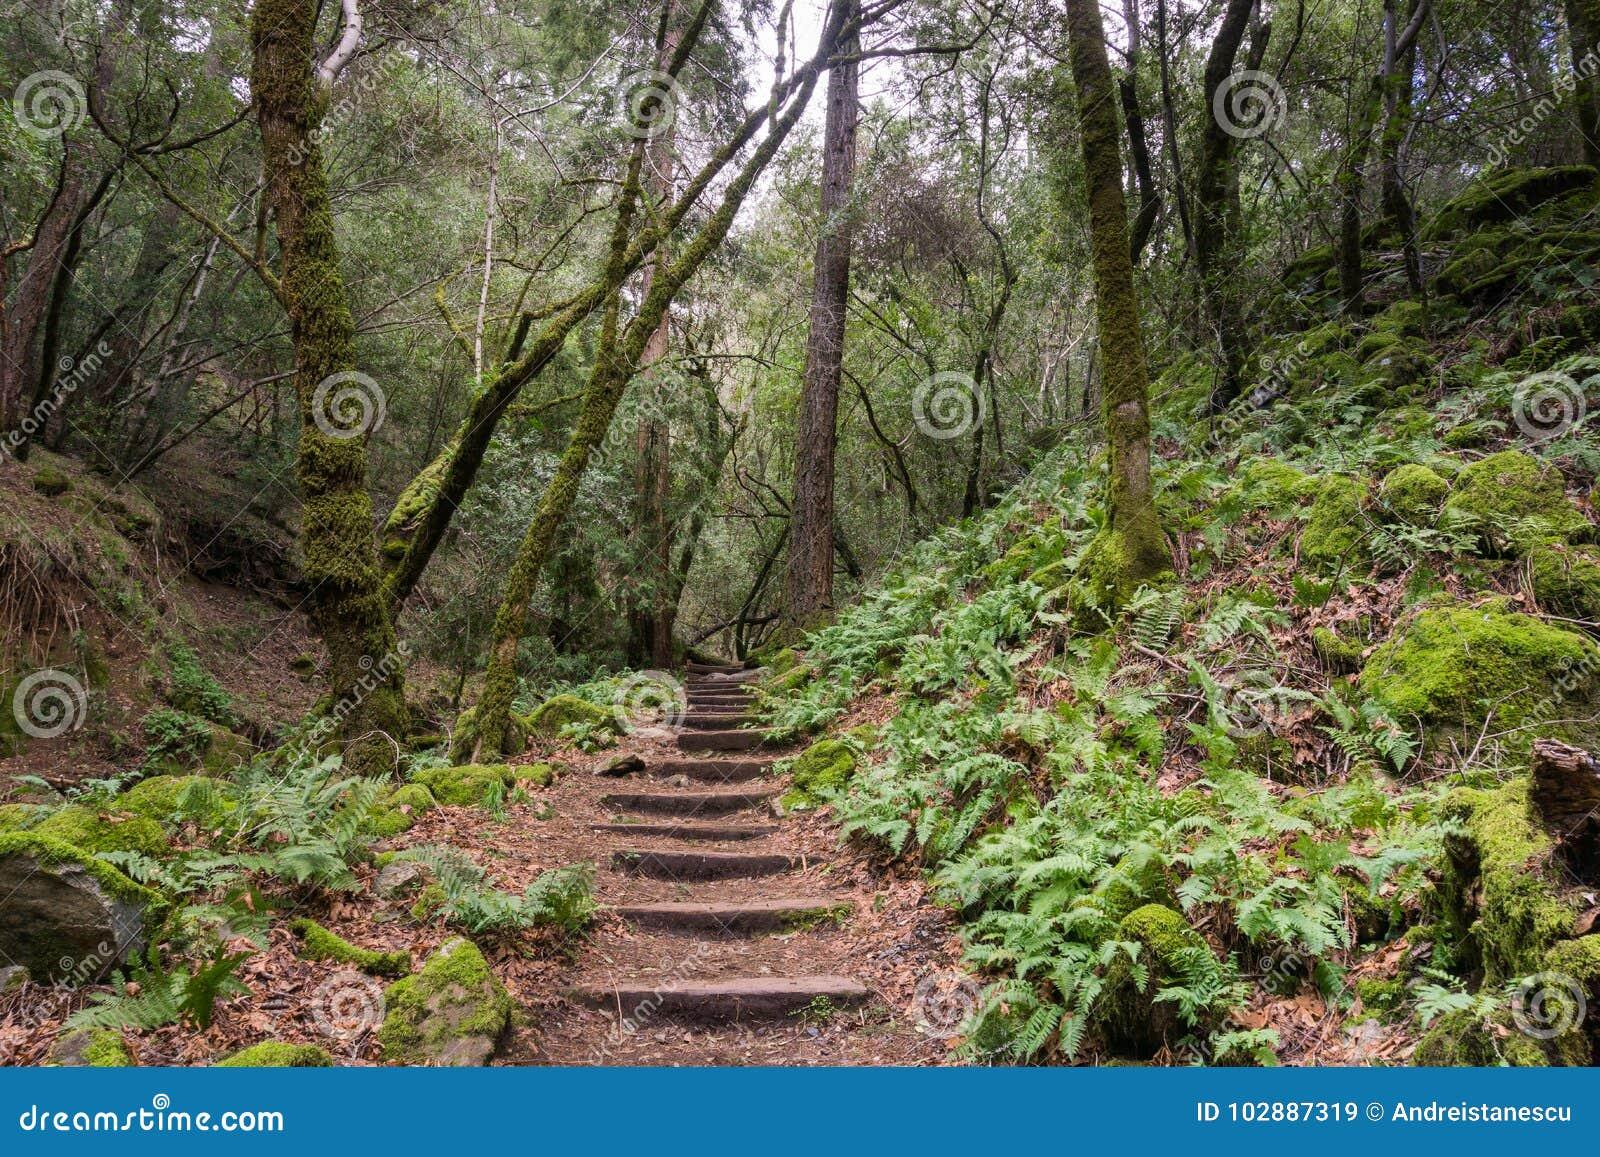 Fern lined hiking trail, Sugarloaf Ridge State Park, Sonoma County, California